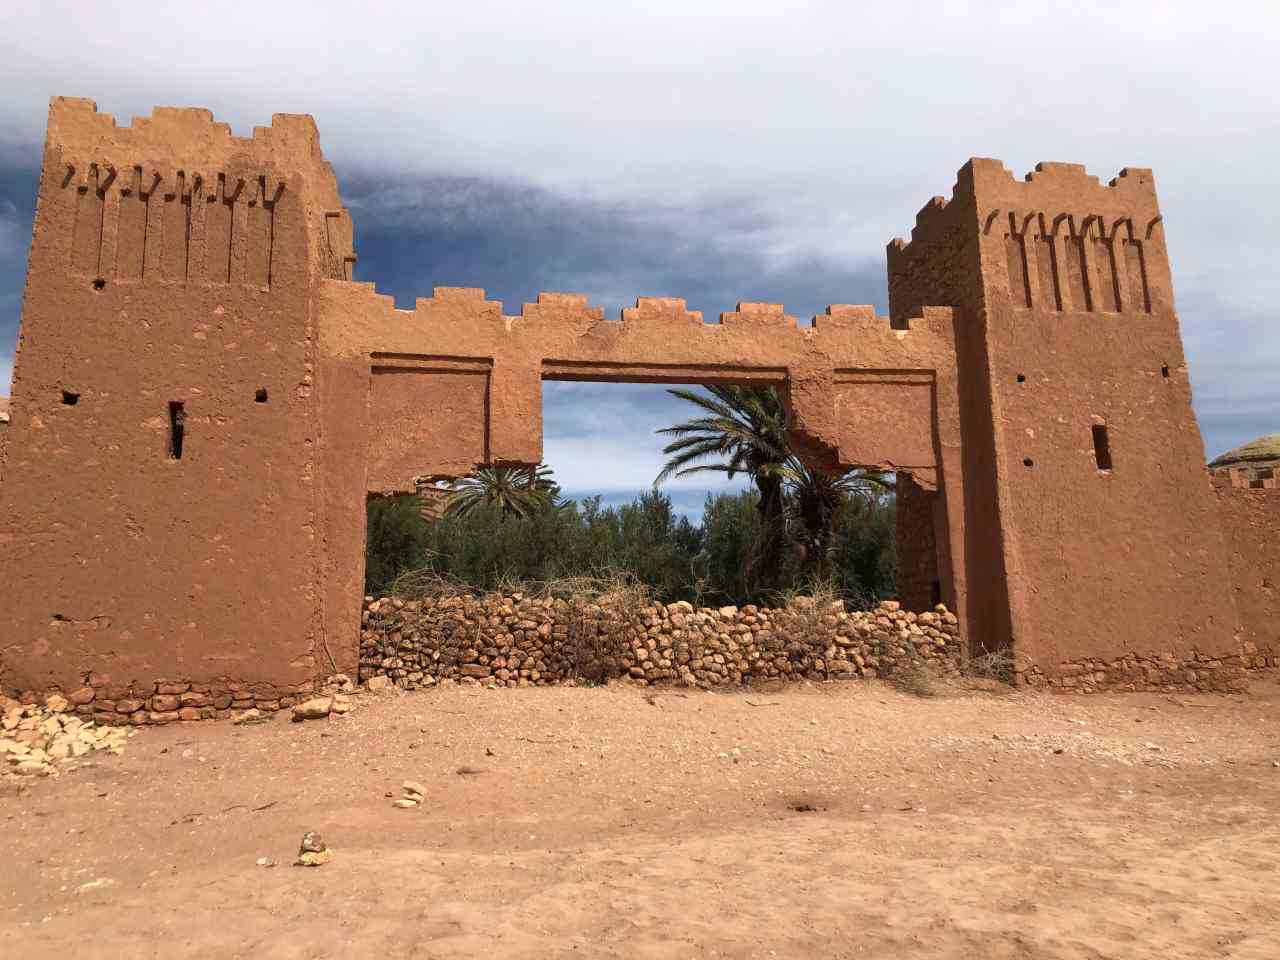 Fake city gate from Gladiator at Ait Benhaddou